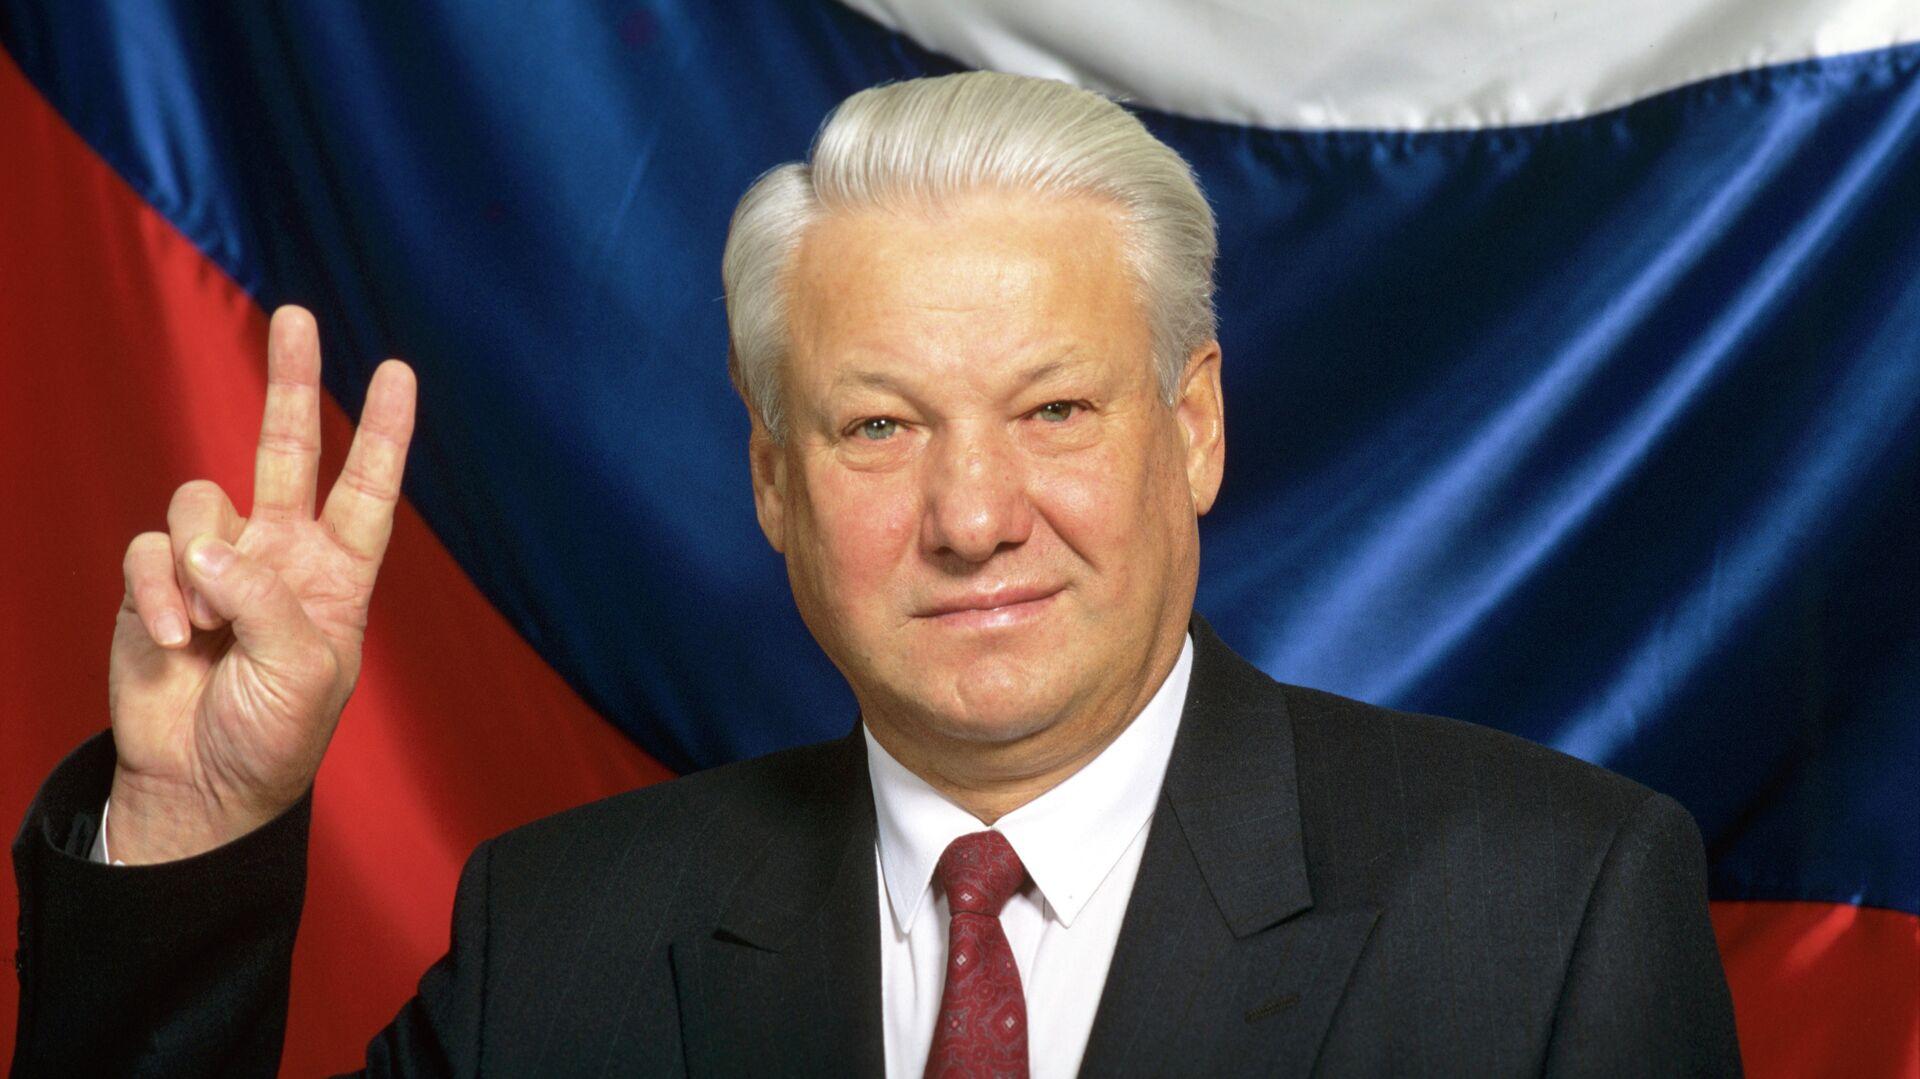 Борис Николаевич Ельцин - РИА Новости, 1920, 12.06.2011